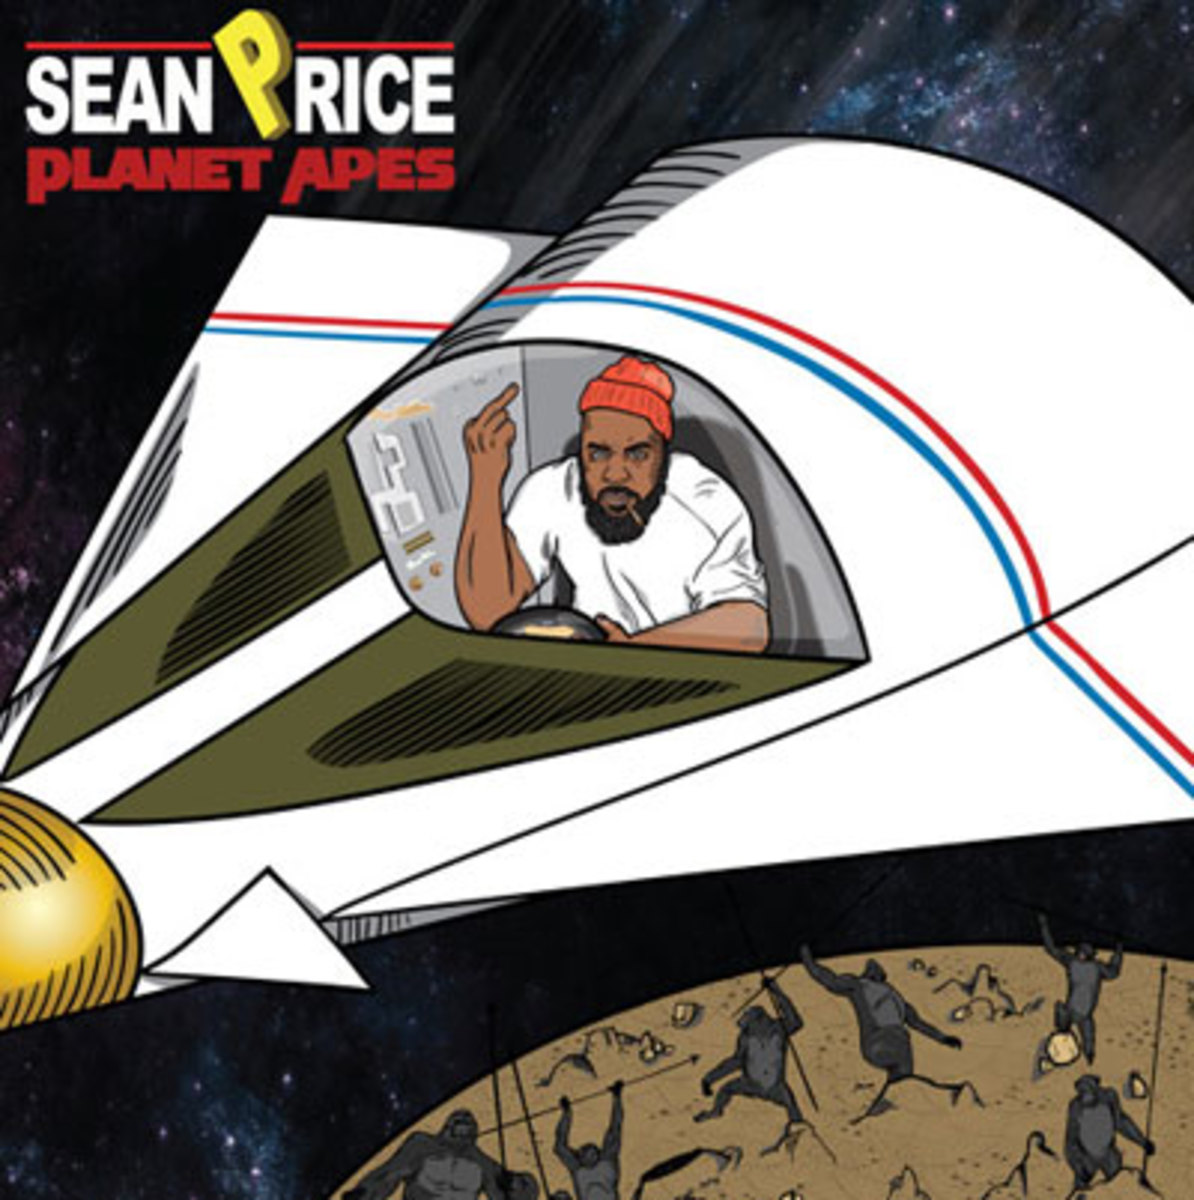 sean-price-planet-apes.jpg